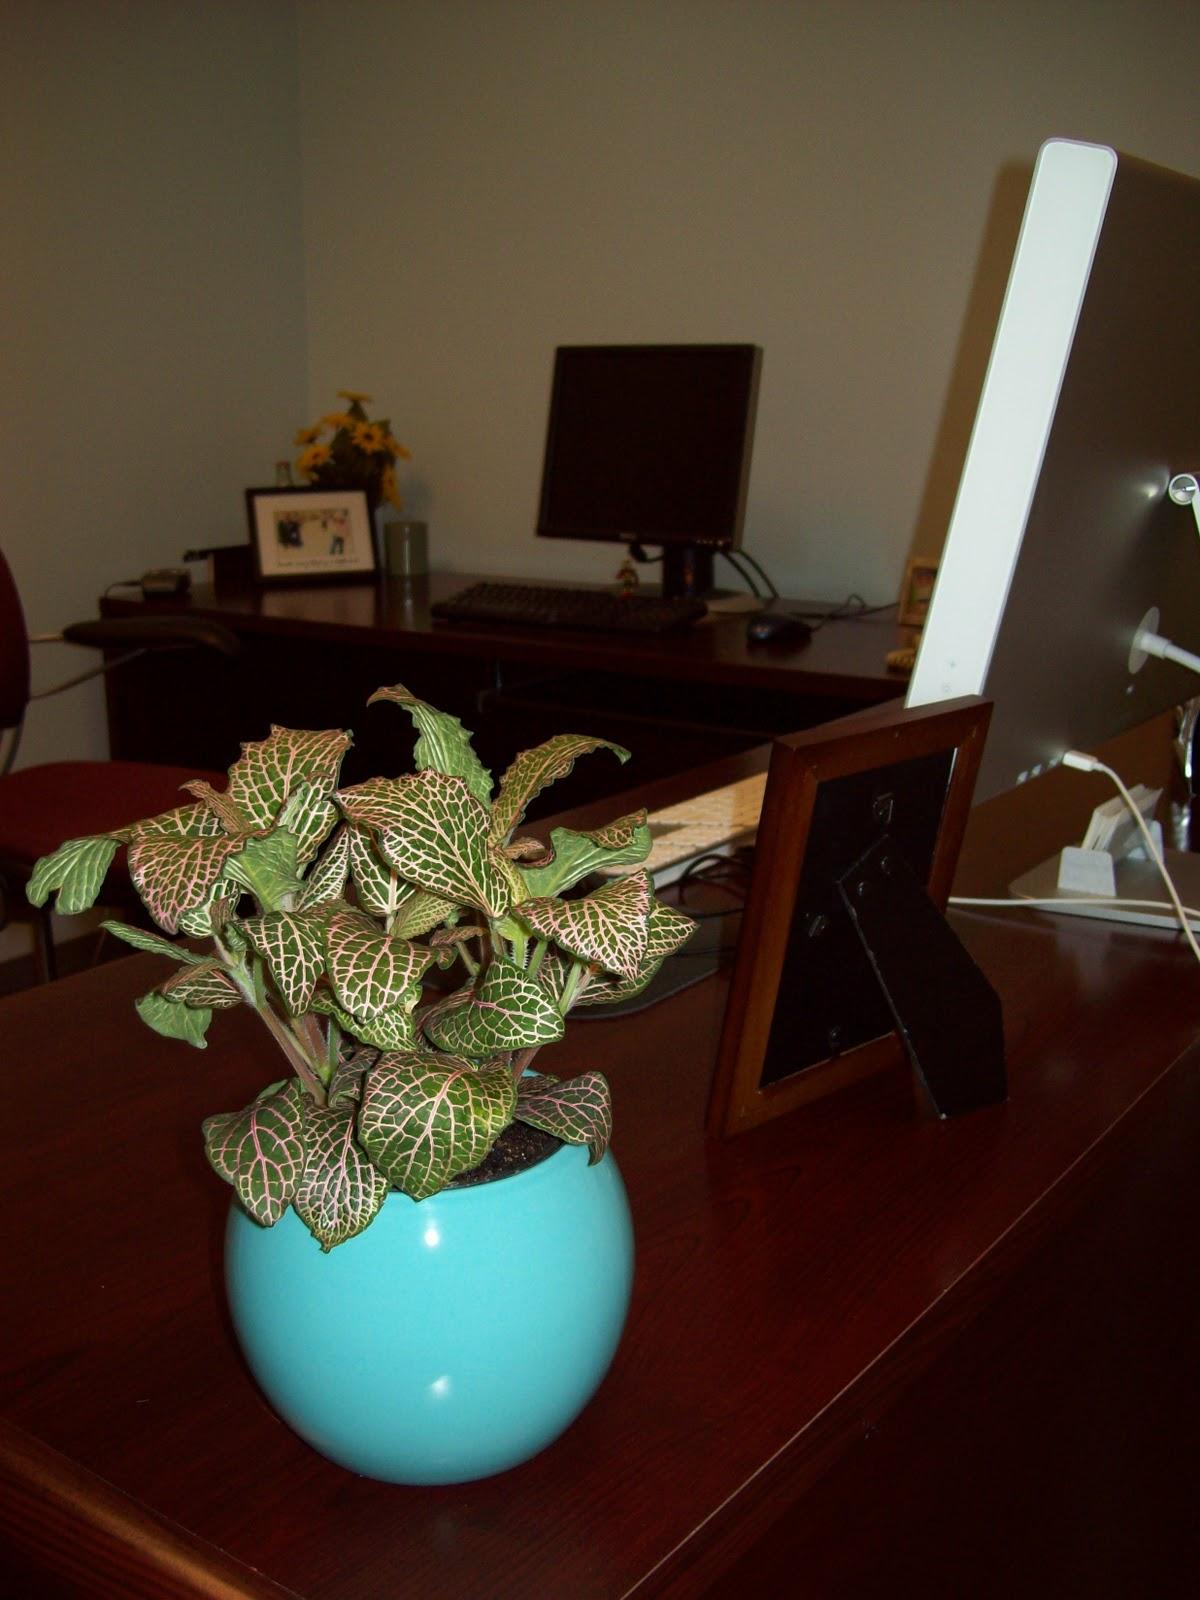 My Workspace - 000_0011.JPG